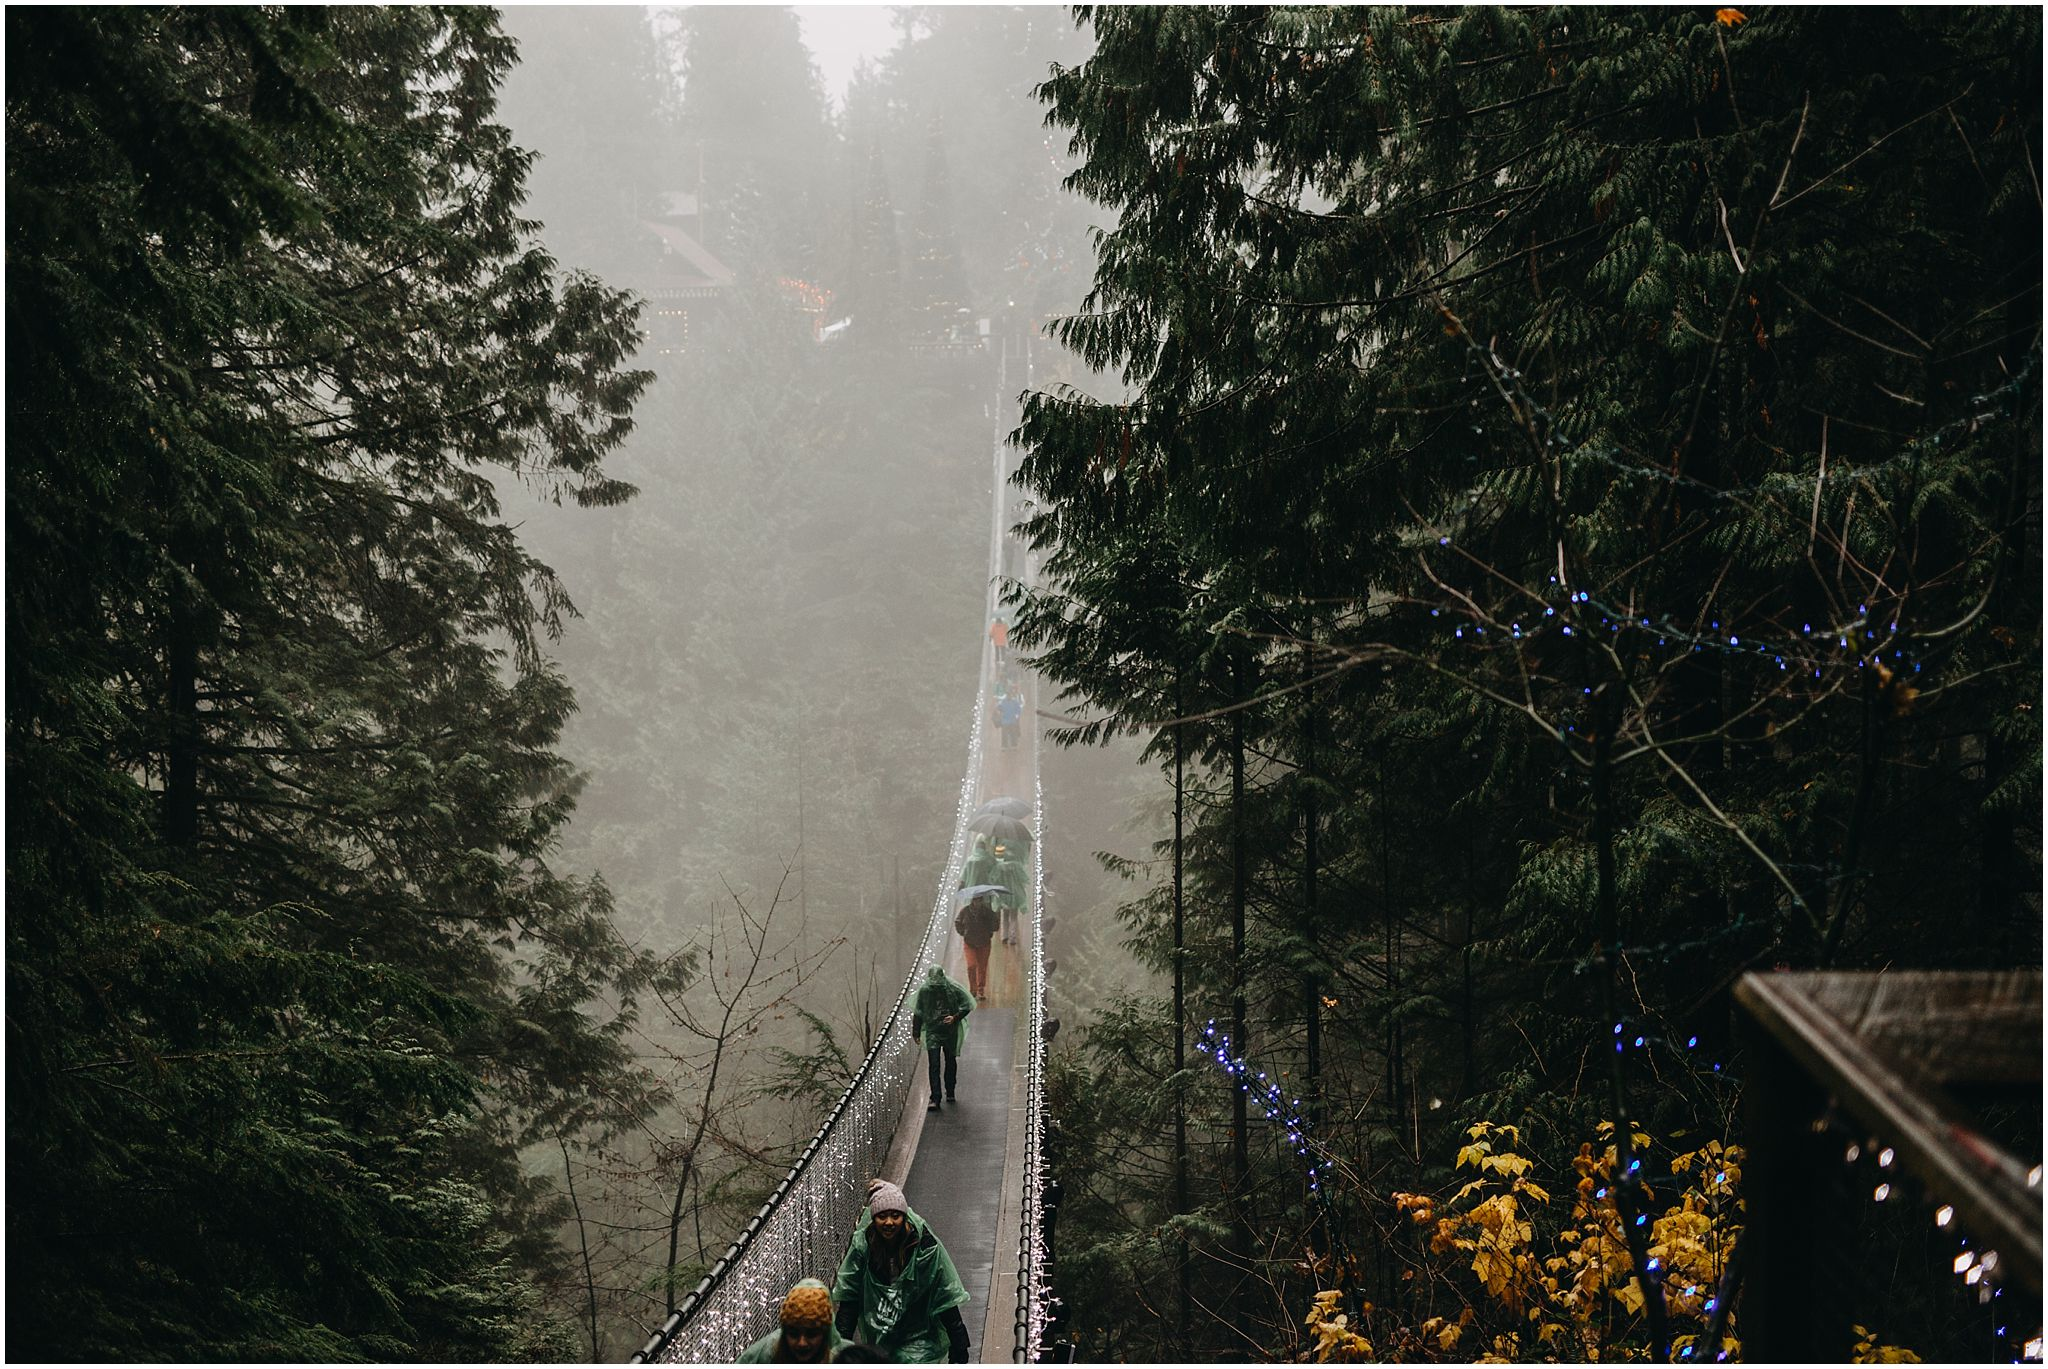 capilano suspension bridge foggy rainy day